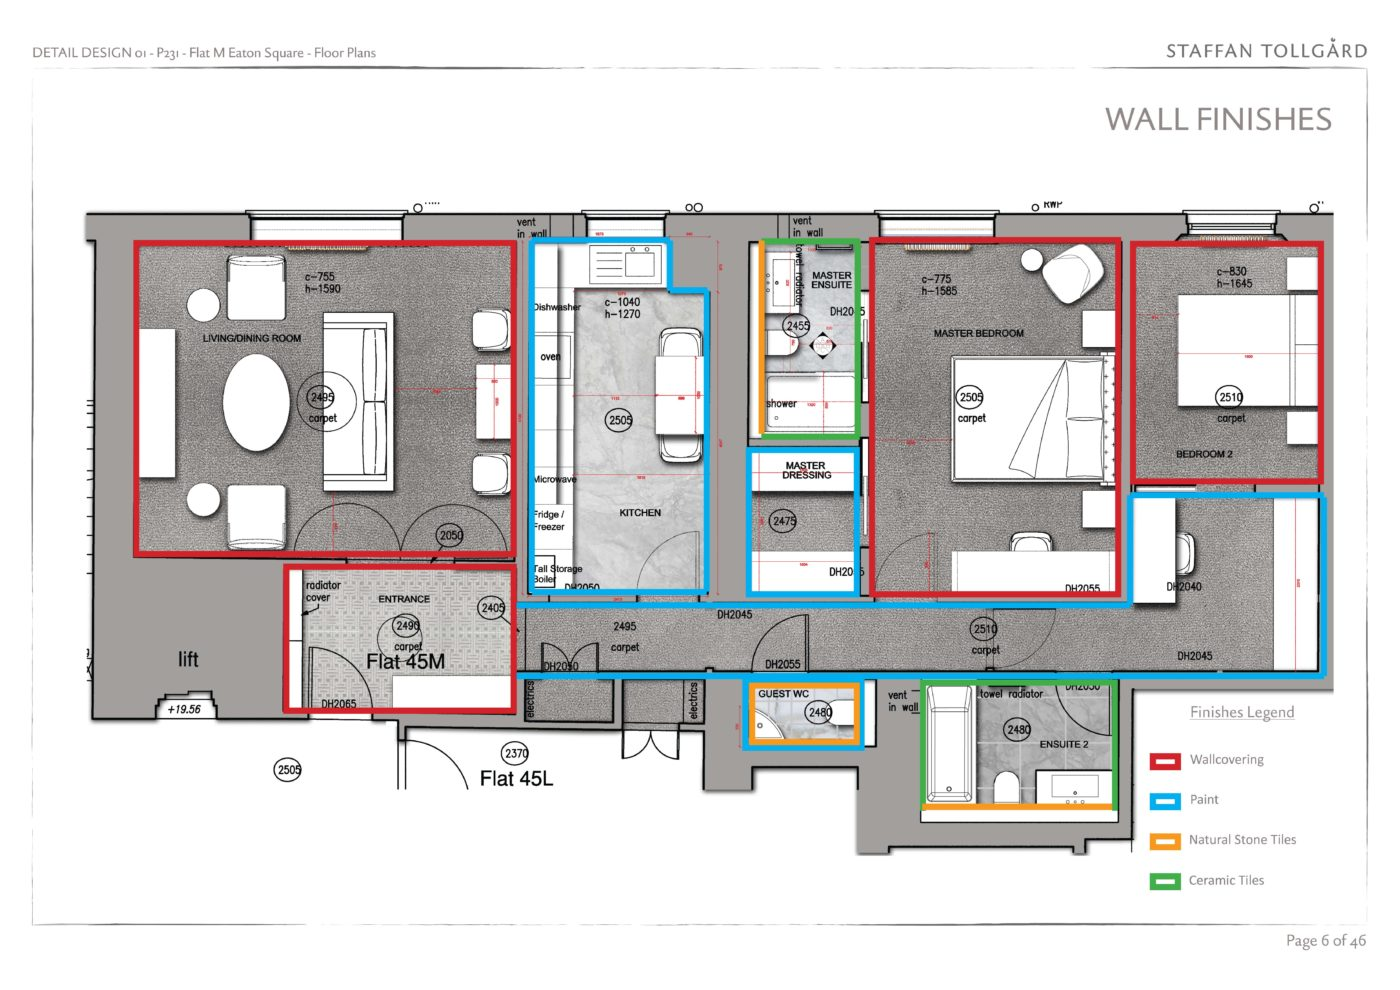 interior designer, inchbald